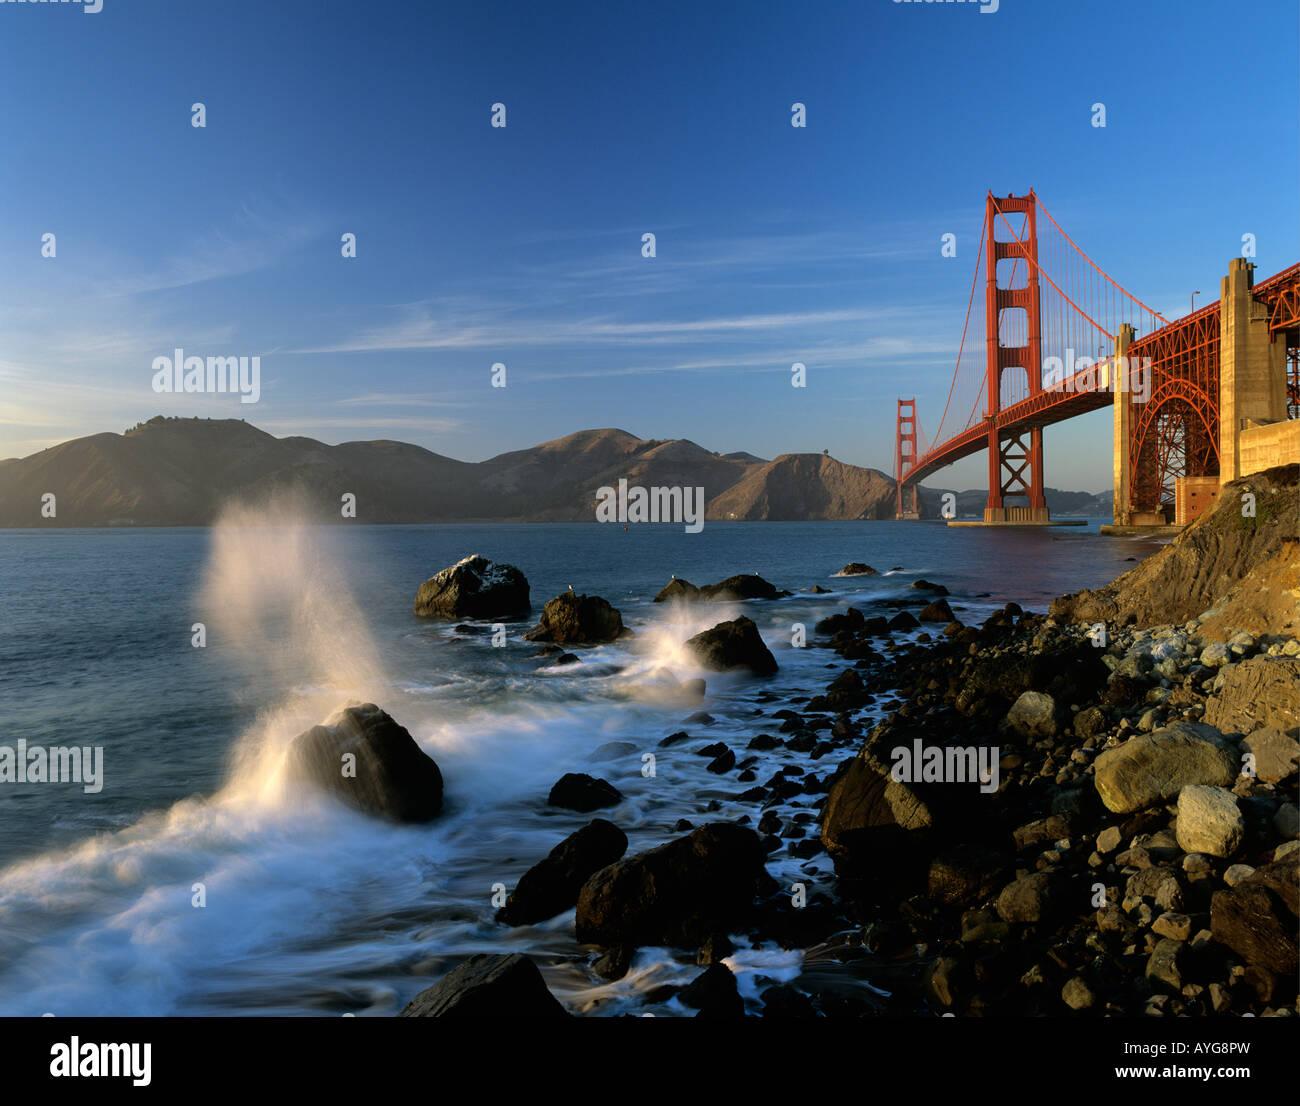 Golden Gate Bridge San Francisco California Sunset Picture: Sunset Light On Golden Gate Bridge From Baker Beach With